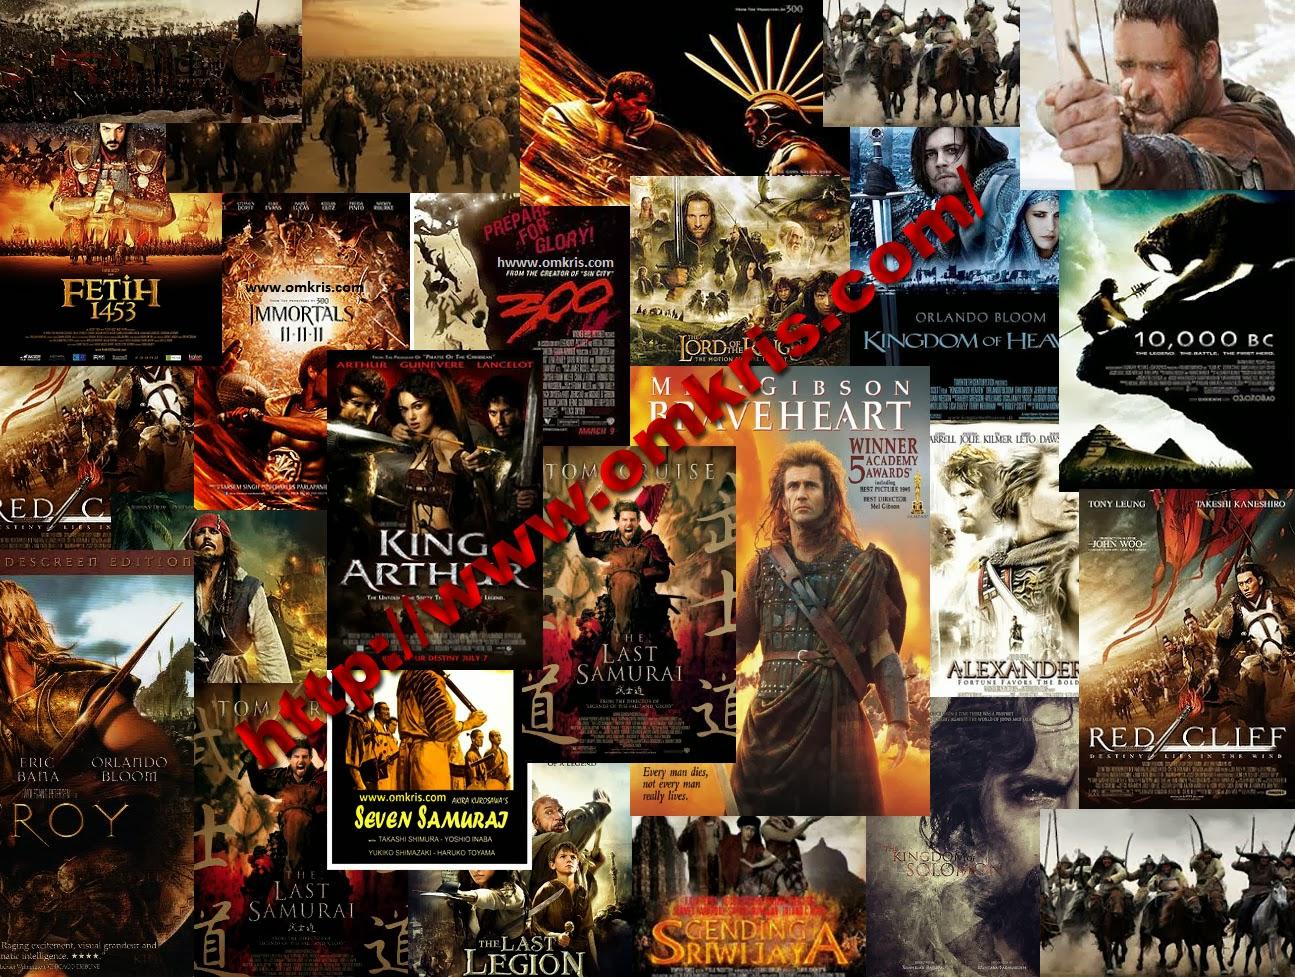 OM Kris : Kumpulan Judul Film-Film Kolosal Terbaik